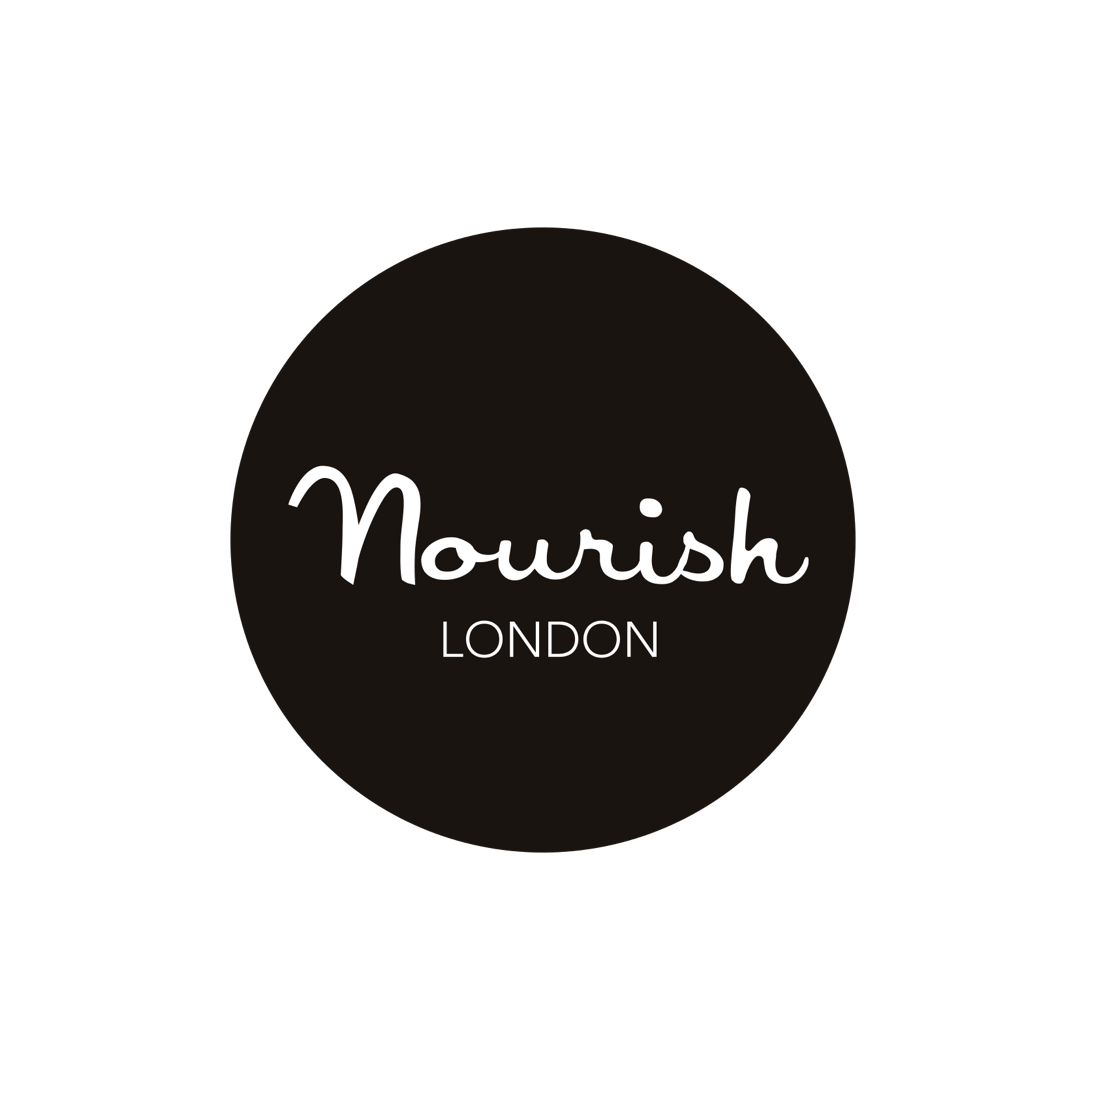 nourish copy.png